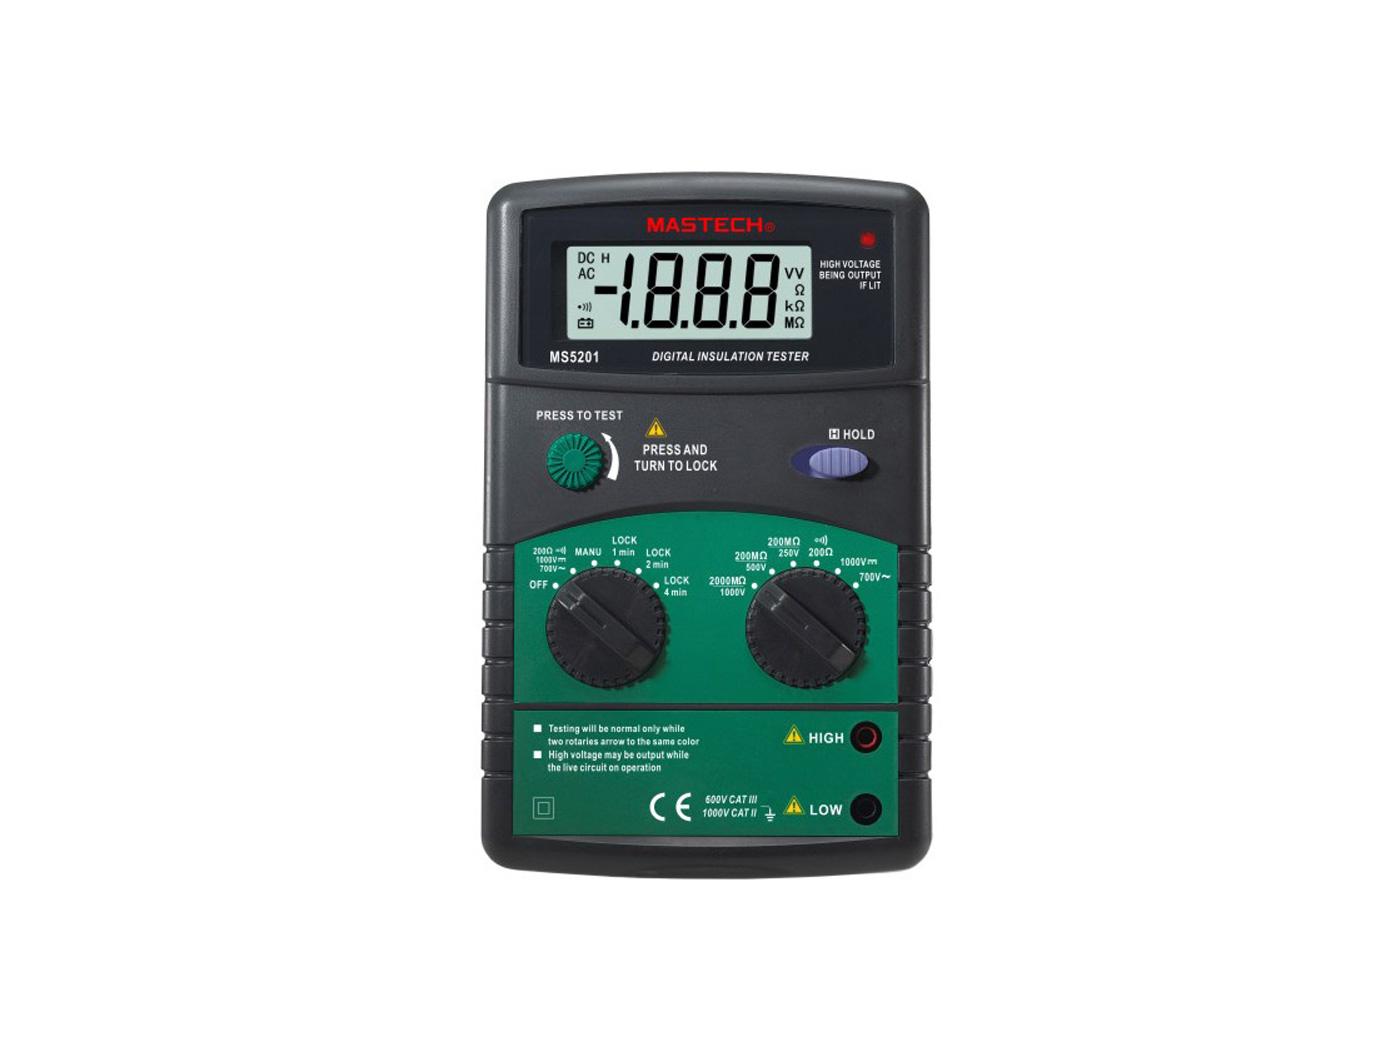 Mastech MS 5201 Digital Insulation Tester